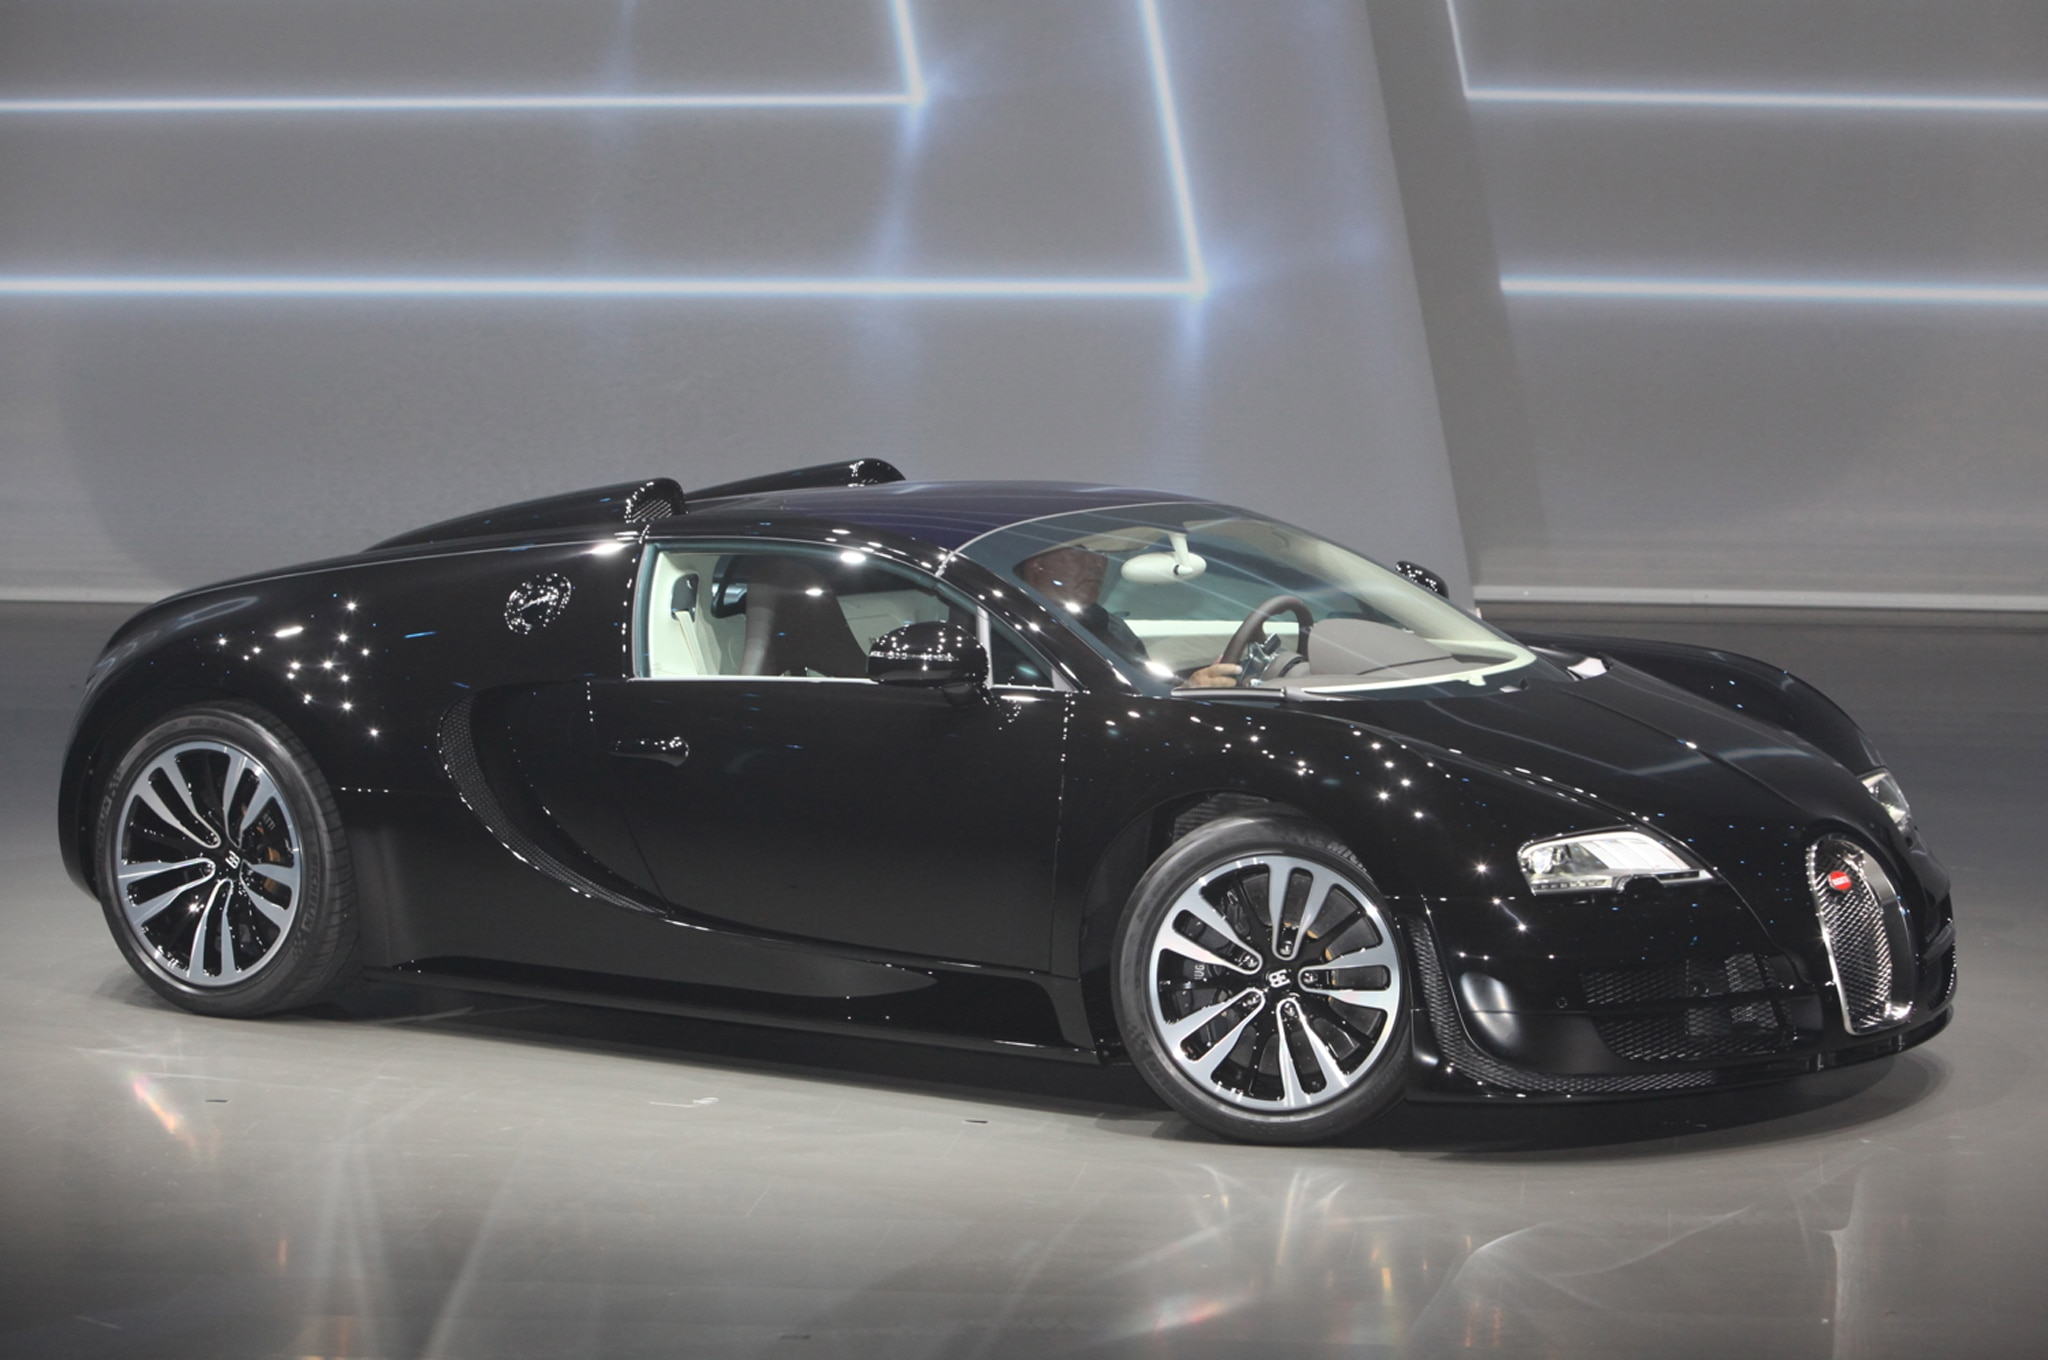 2013 bugatti veyron jean bugatti legend edition first look automobile magazine. Black Bedroom Furniture Sets. Home Design Ideas